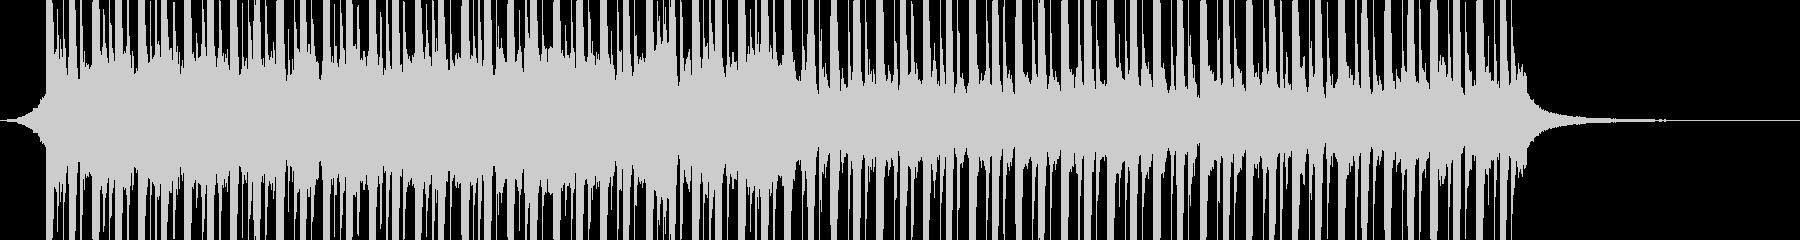 Tropical Moombahton 1の未再生の波形